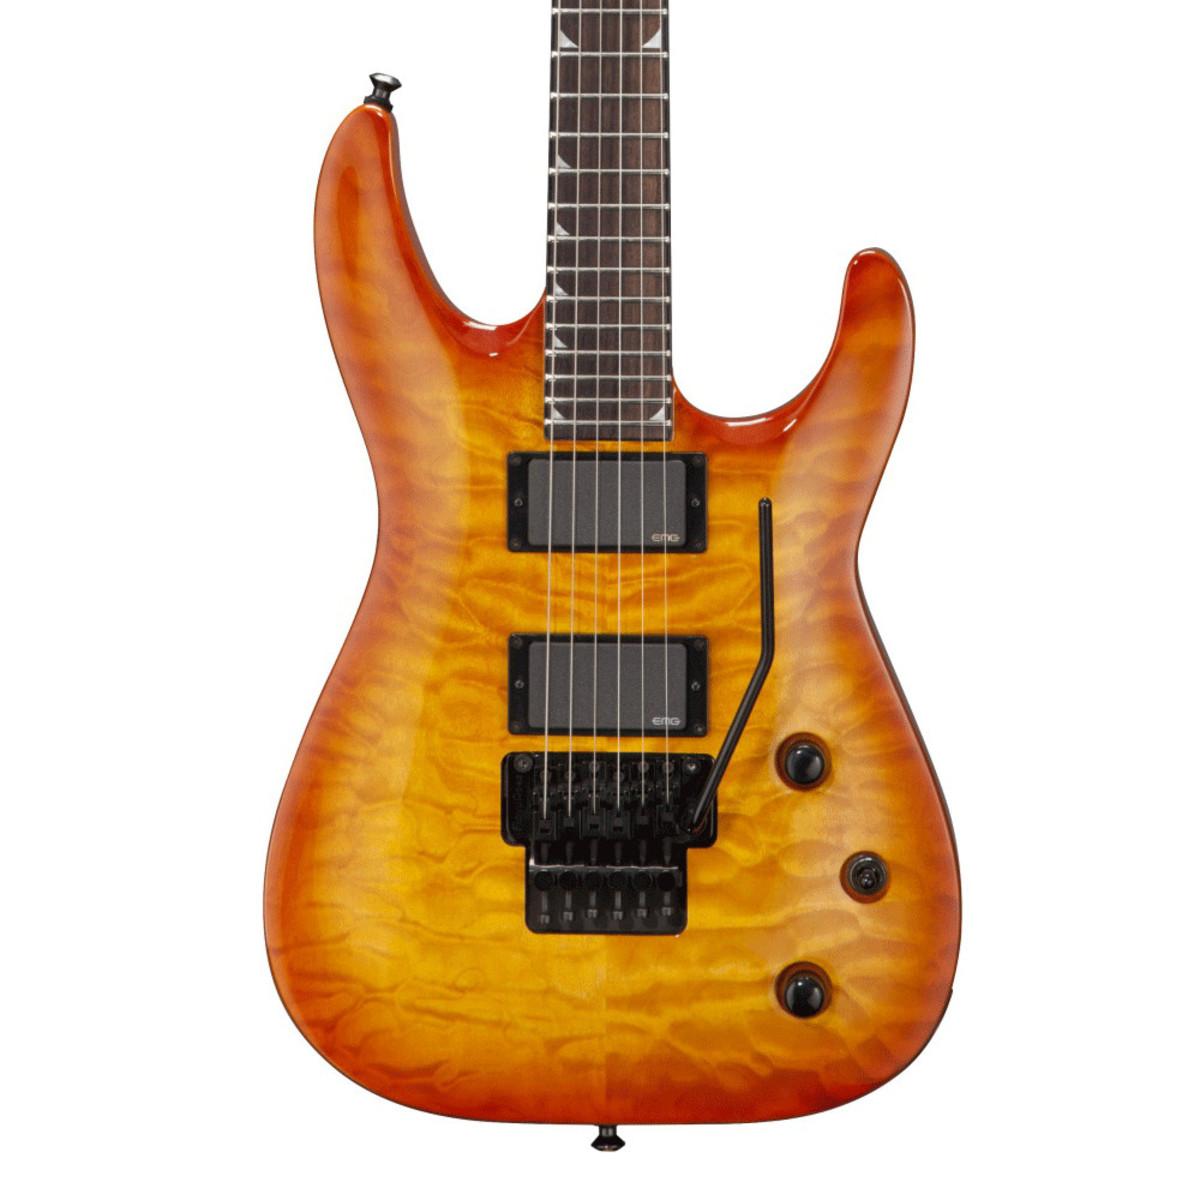 disc jackson x series slatxmgq3 6 soloist guitar trans sunburst at. Black Bedroom Furniture Sets. Home Design Ideas